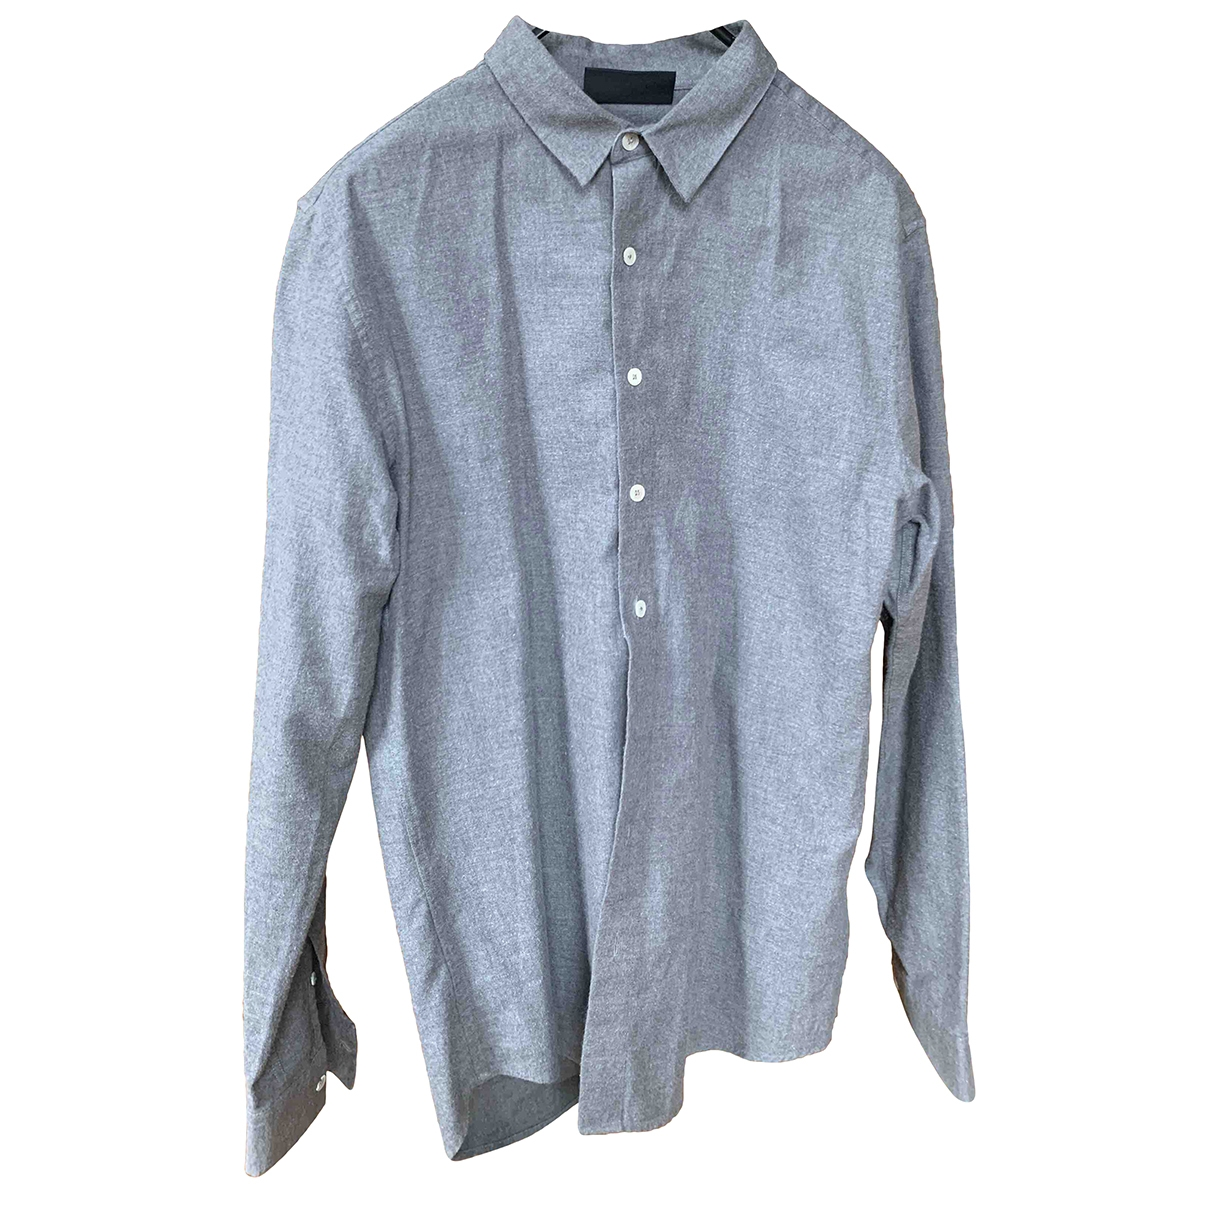 Harmony \N Grey Cotton Shirts for Men M International